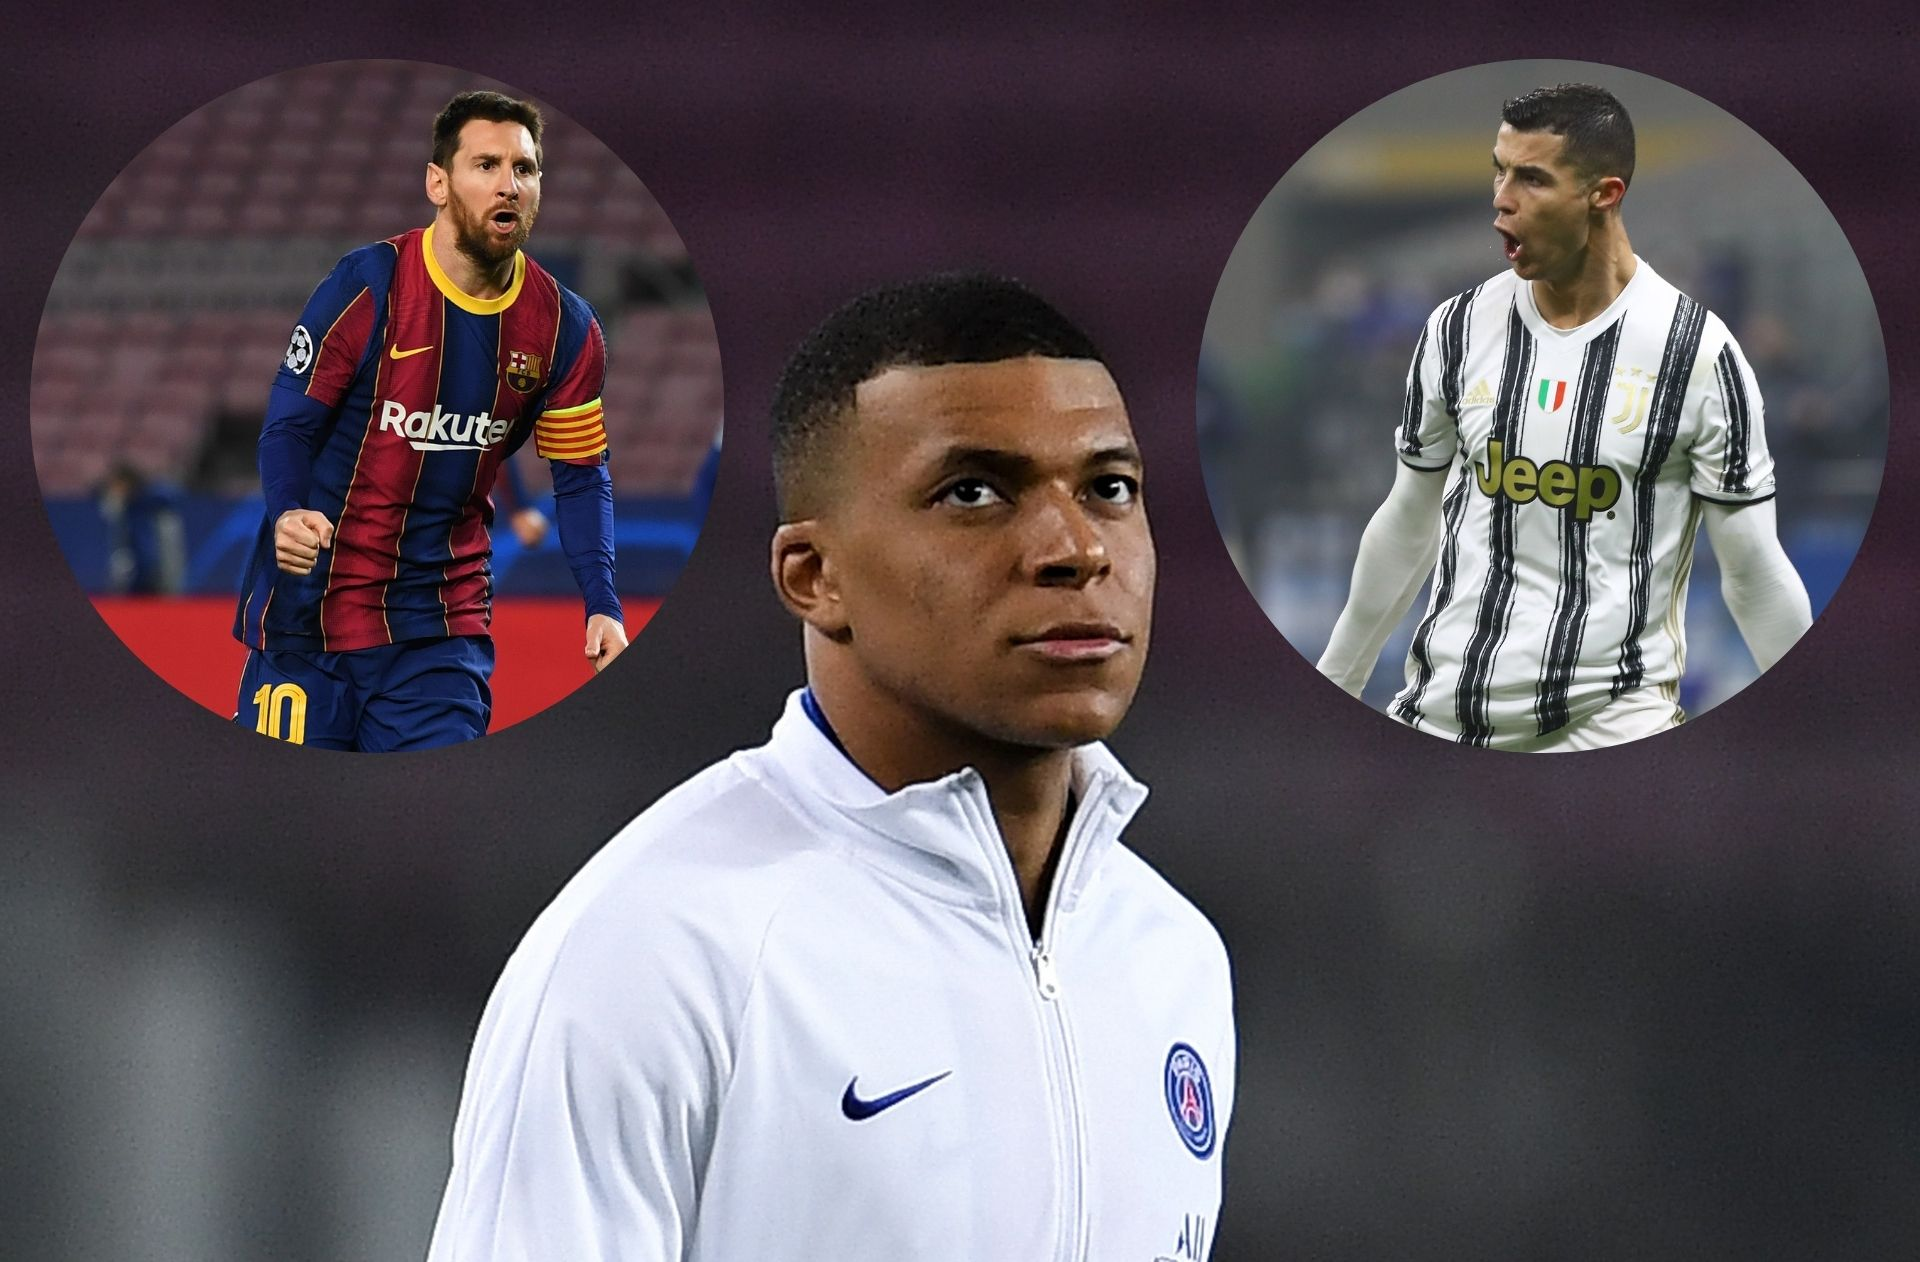 Ronaldo, Mbappe, Messi